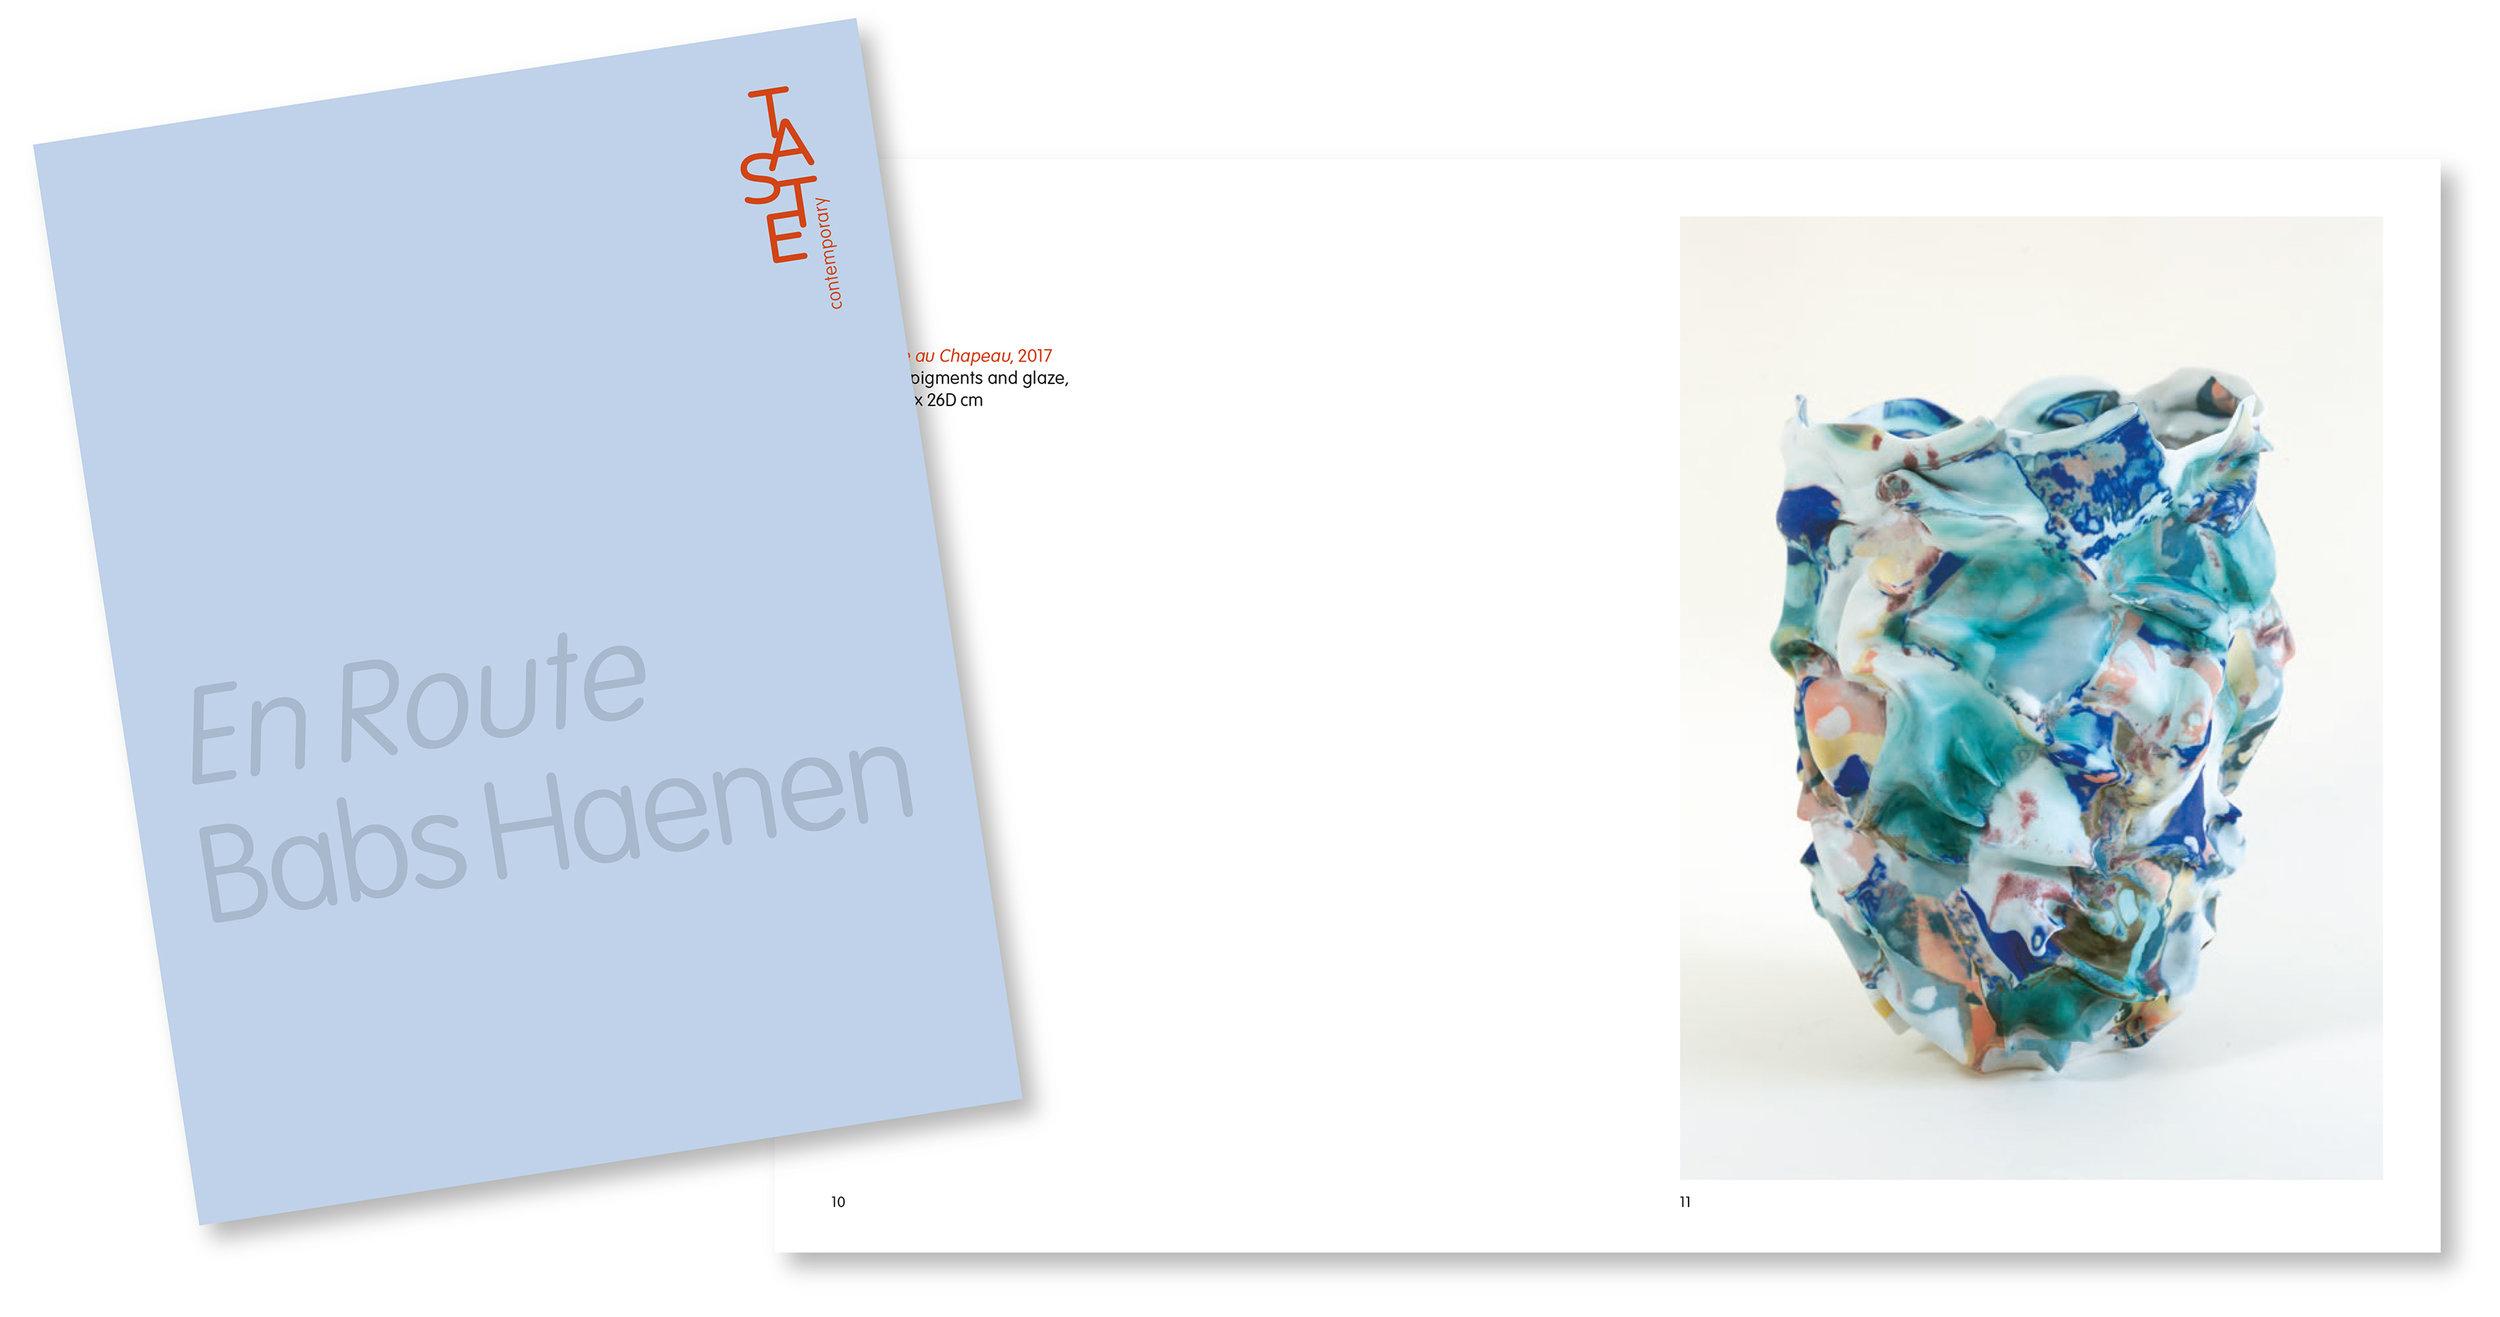 En Route – a solo exhibition by Babs Haenen_Taste_2018.jpg